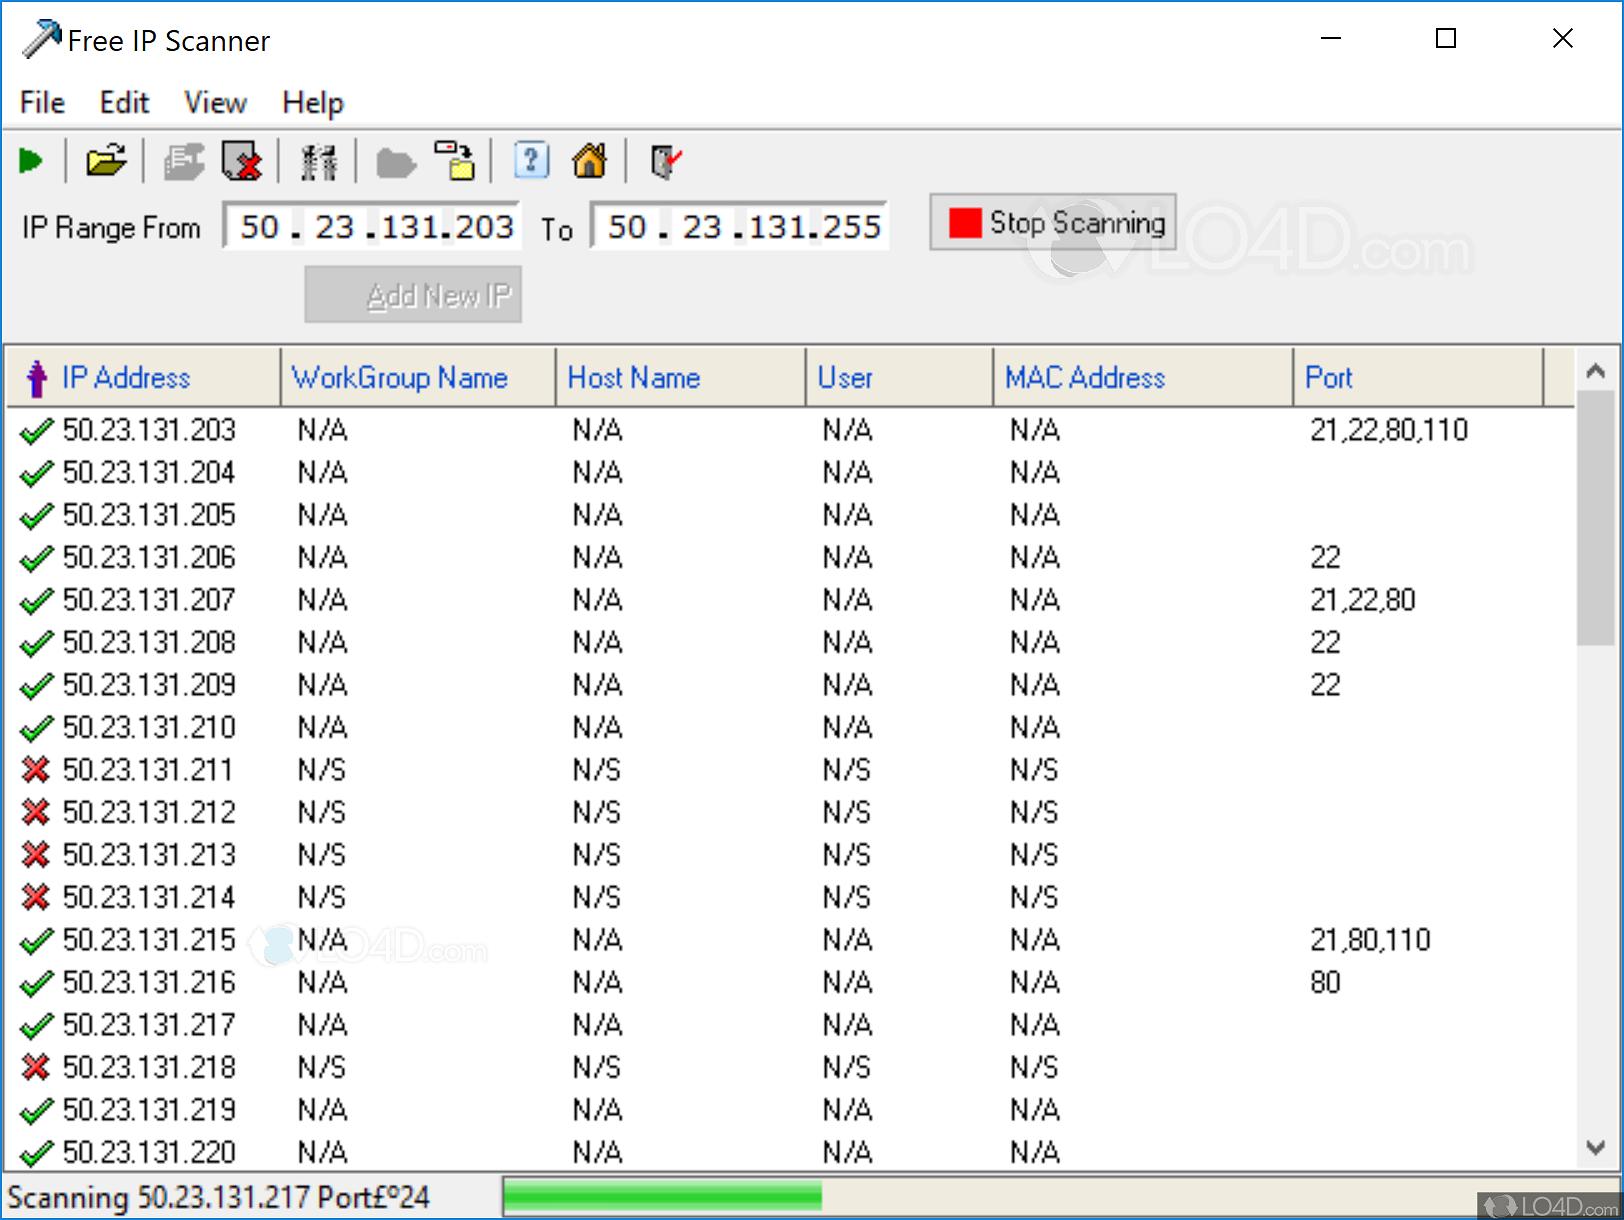 Free IP Scanner - Screenshots